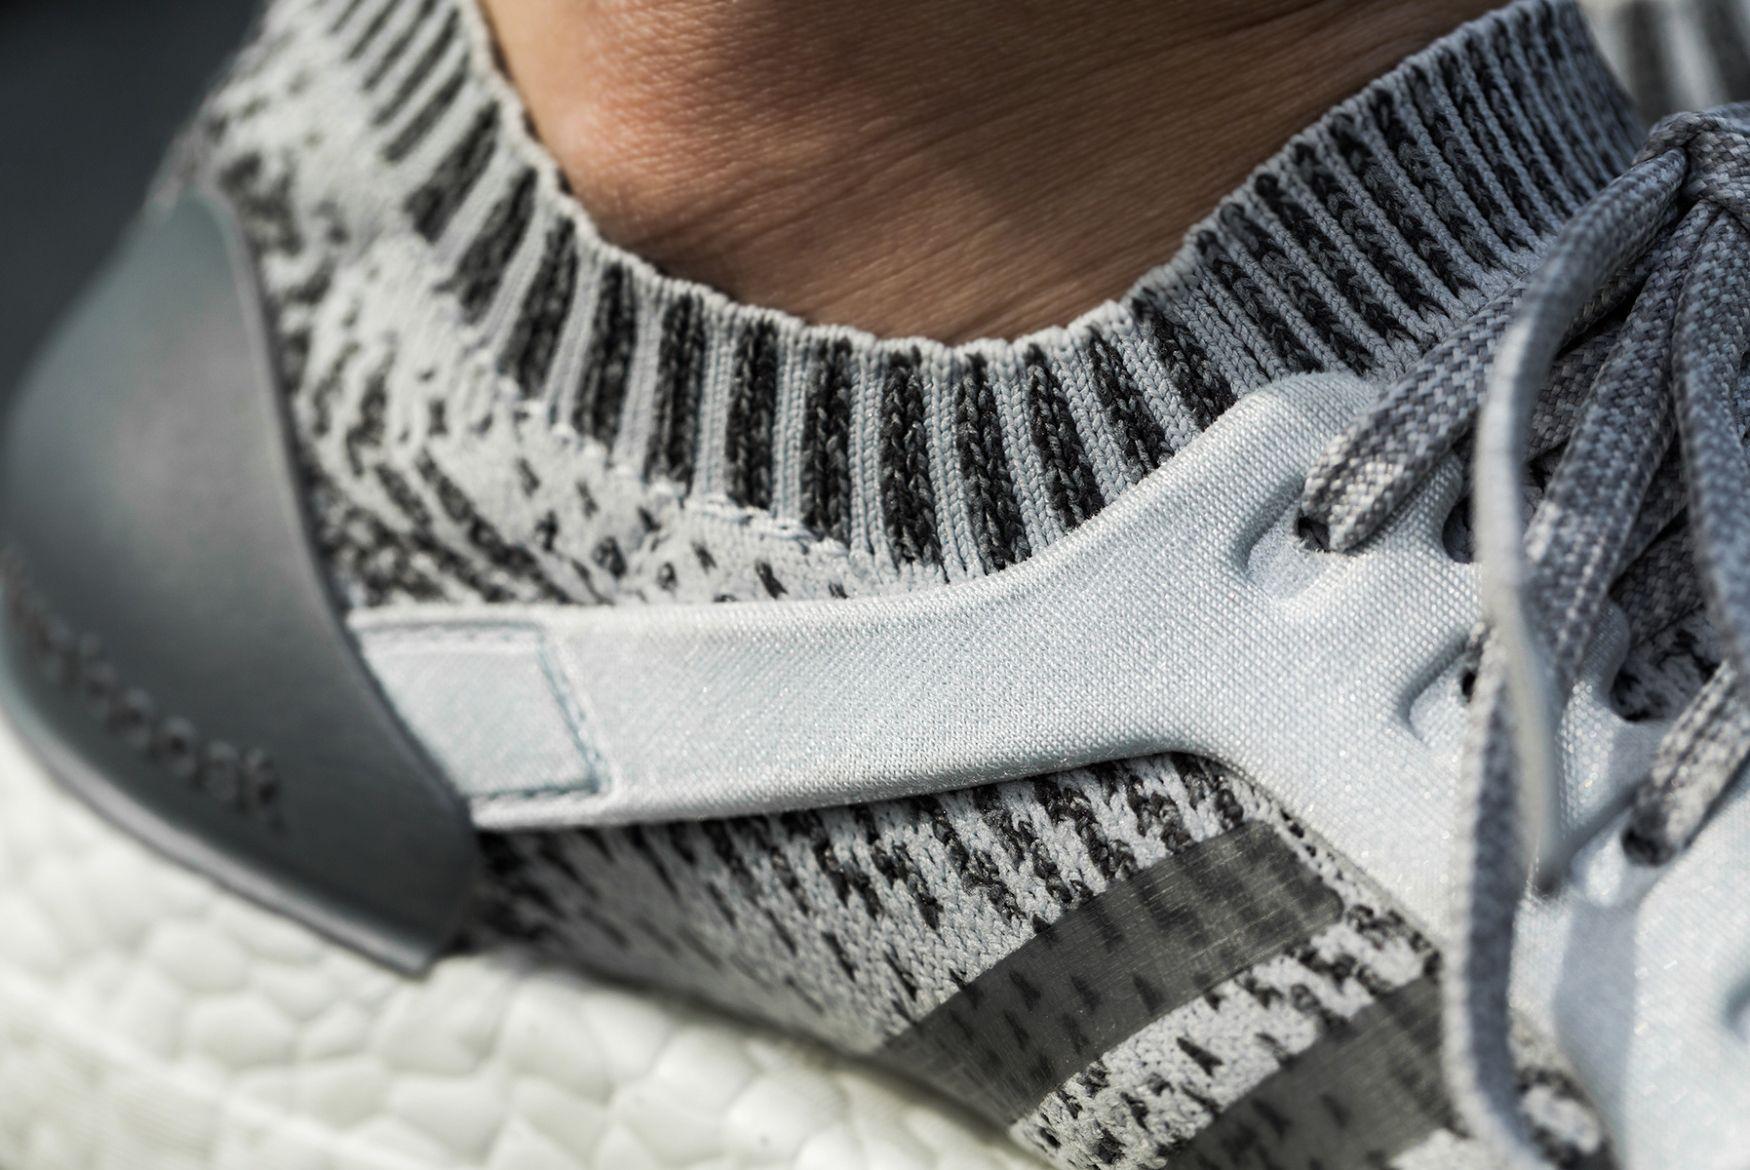 Adidas Ultraboost X Closer Look 4